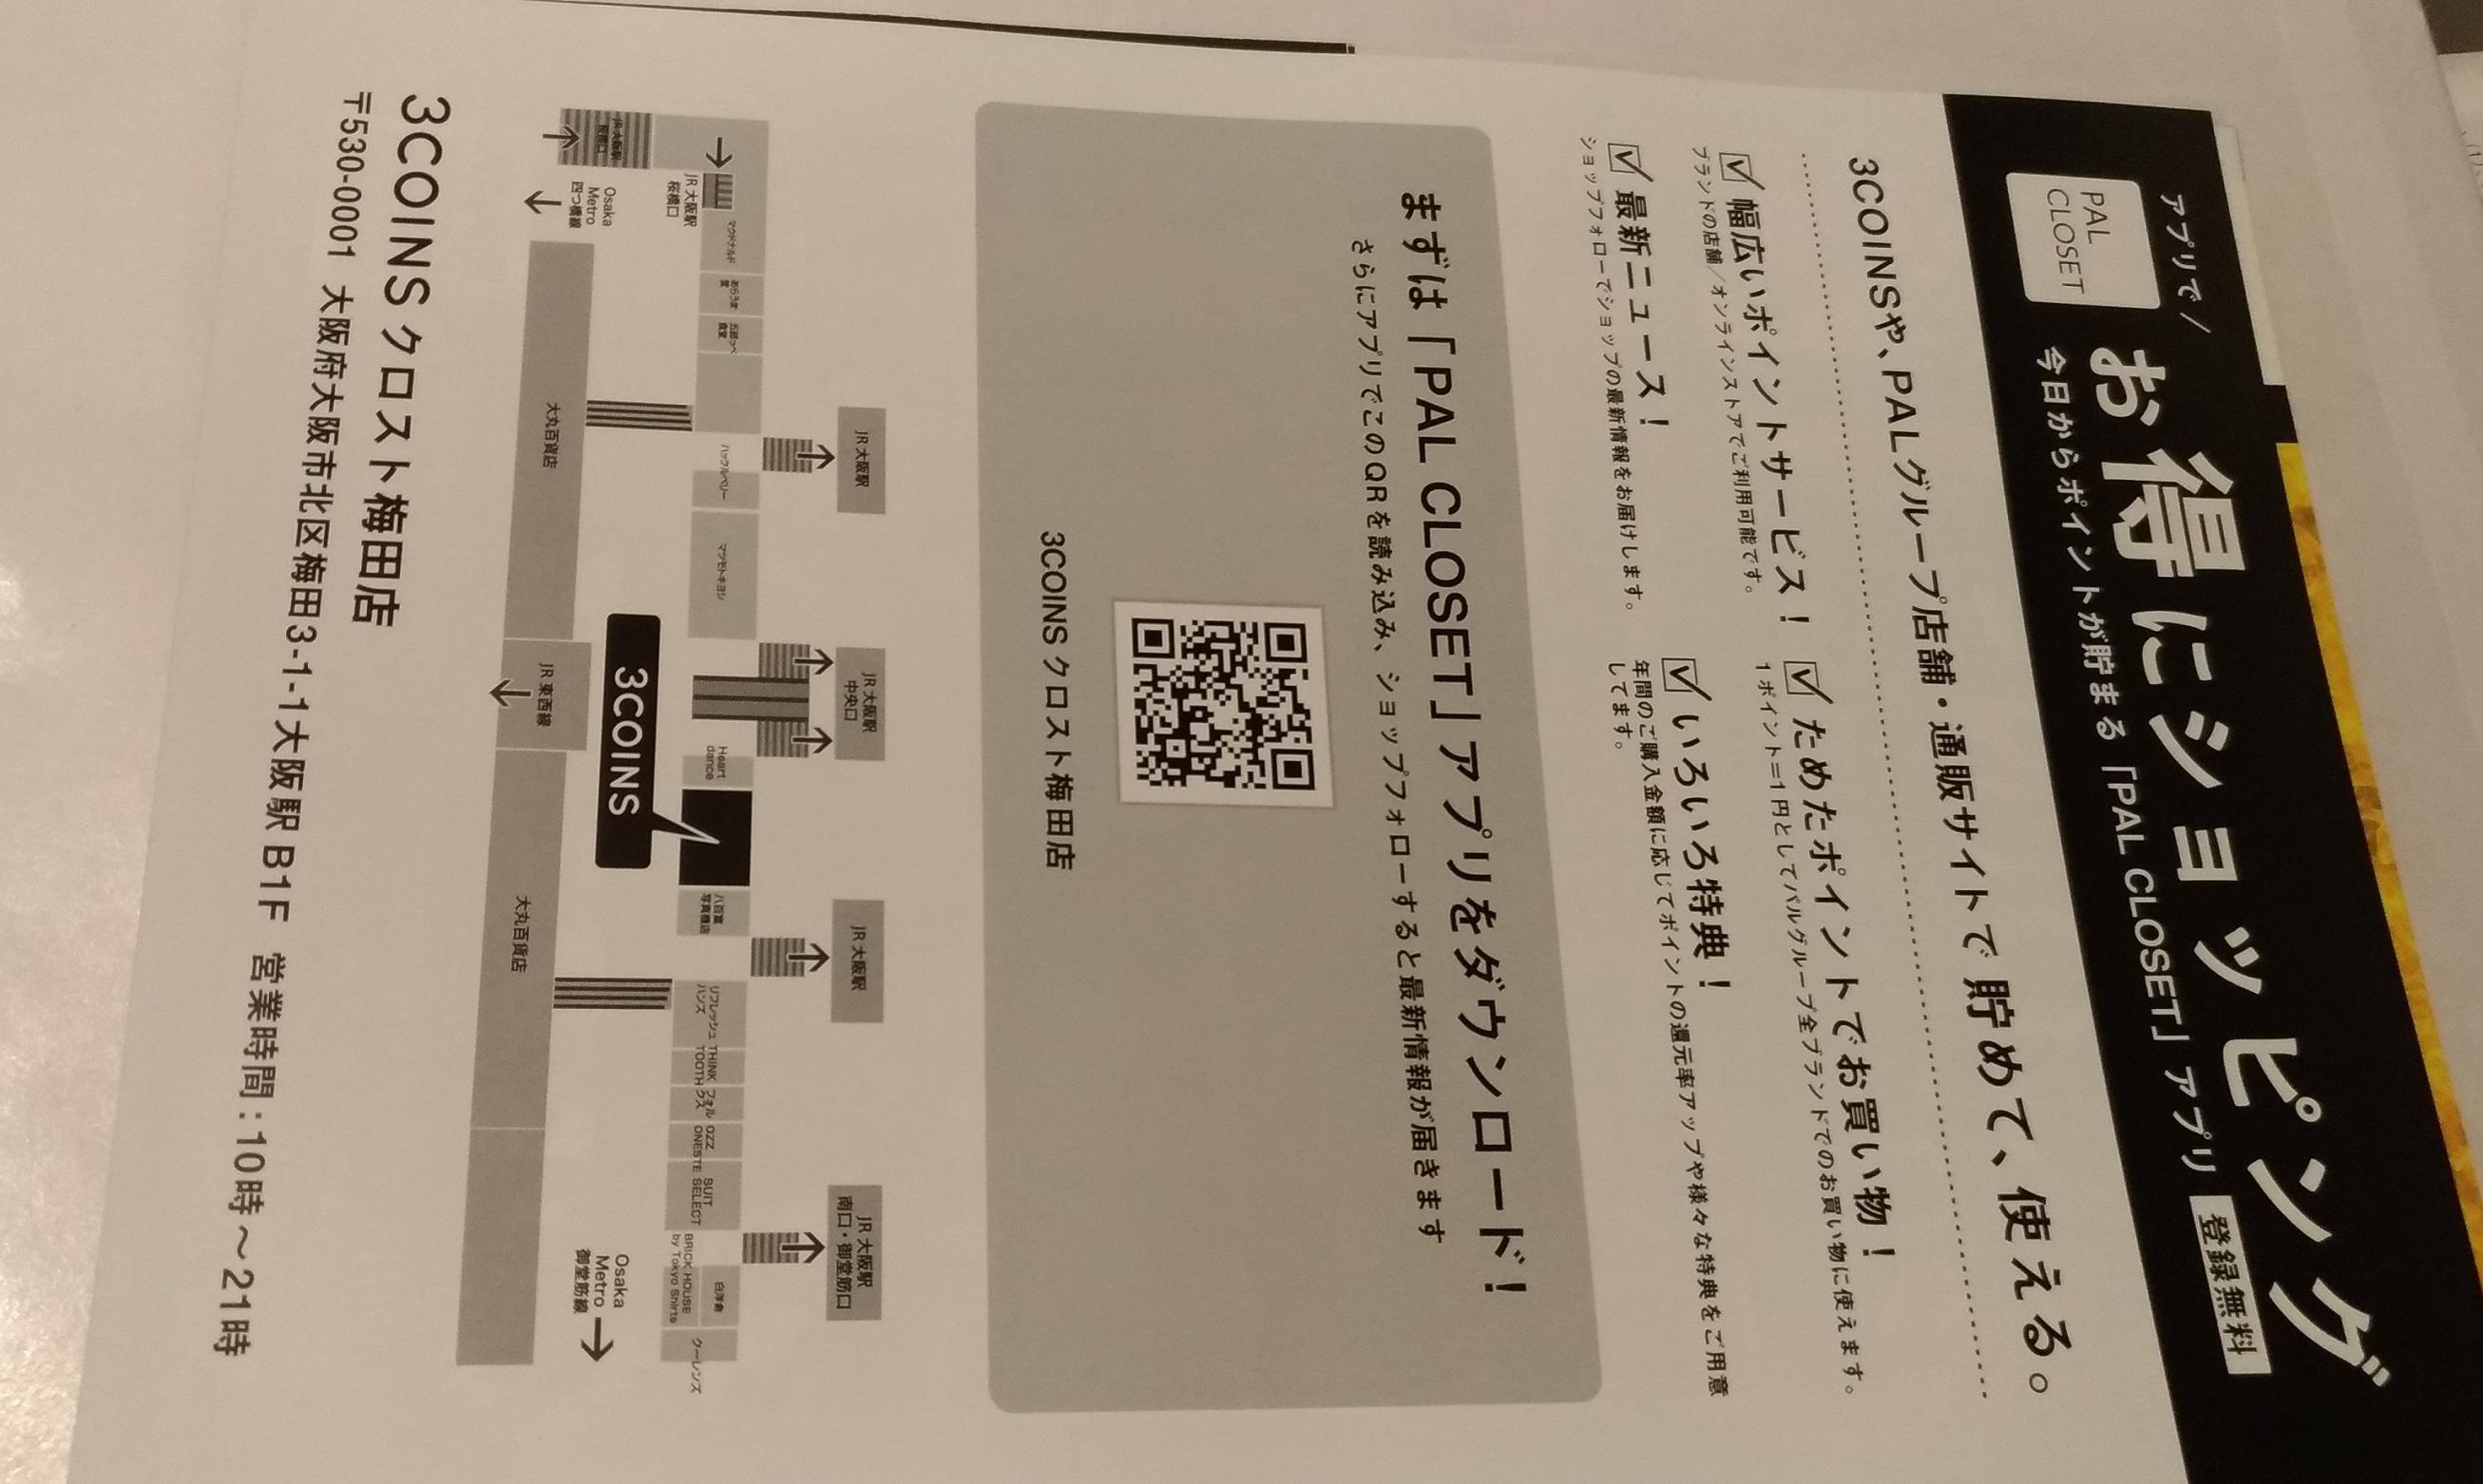 osaka_new_open_prezent_umeda_3coins_1.jpg